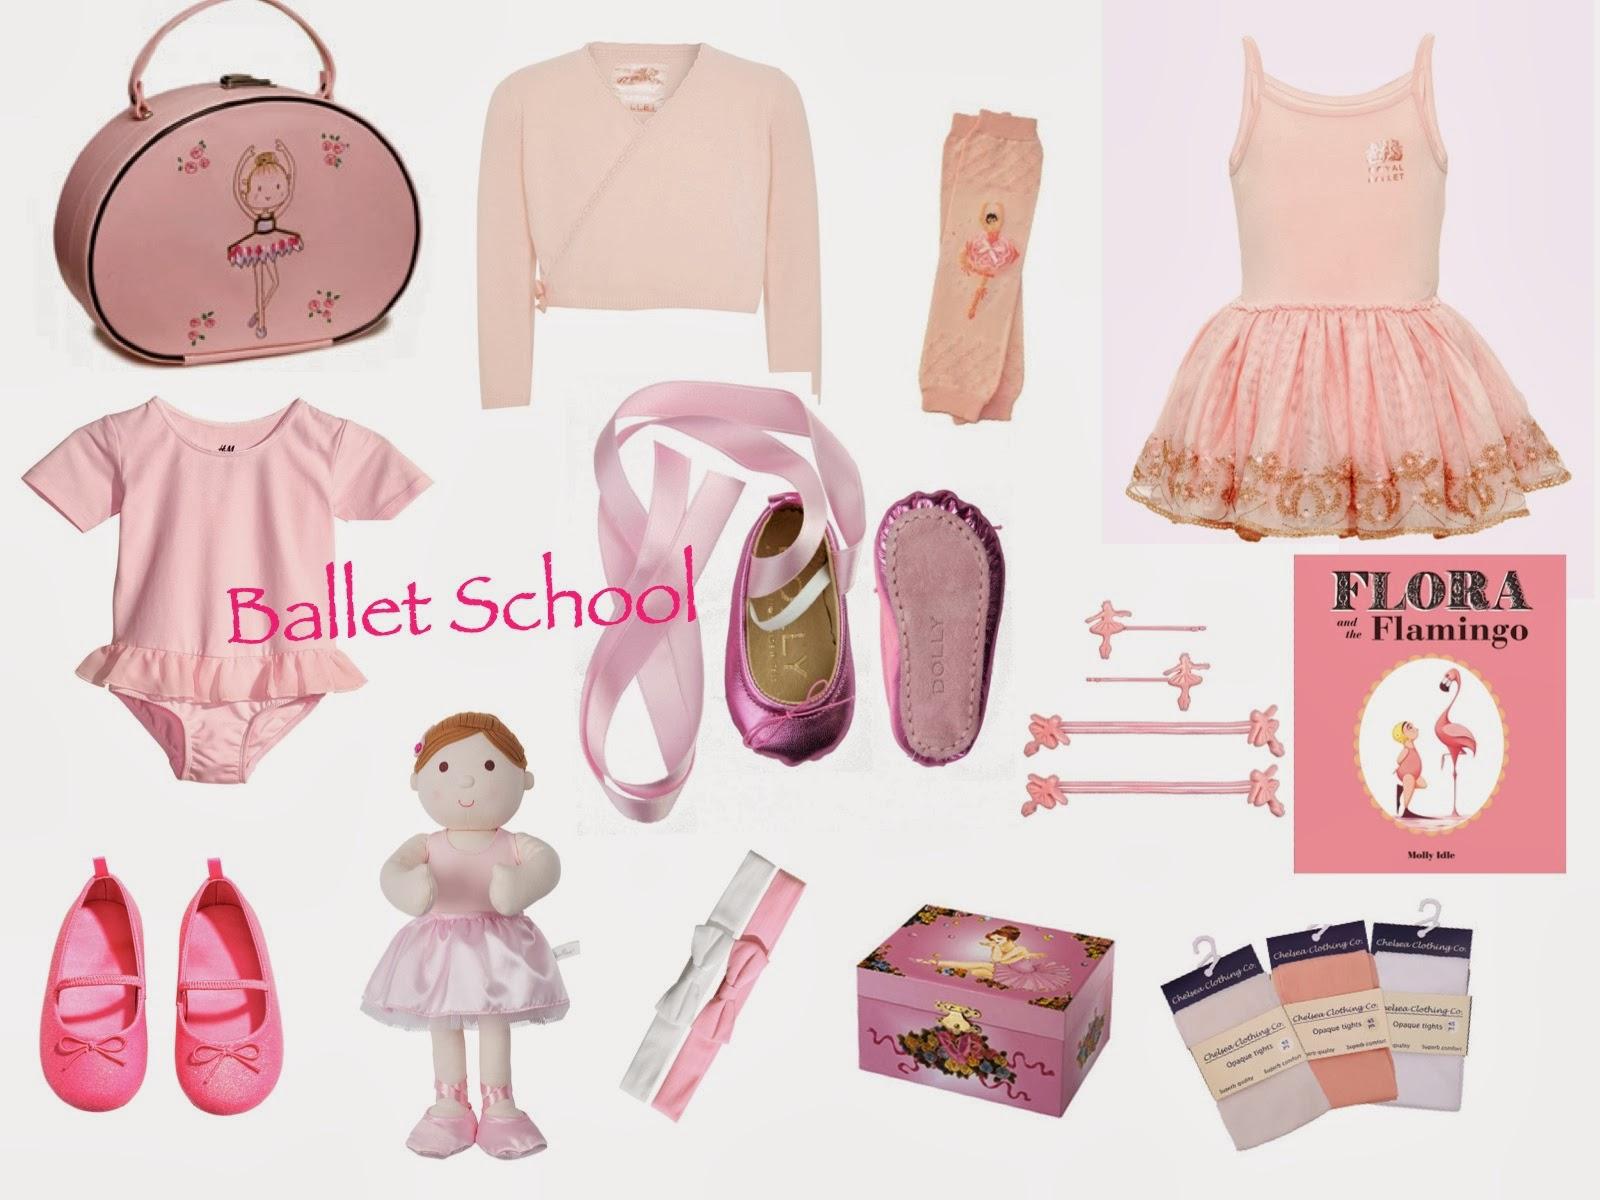 baby ballet is big kids dance classes that help to build